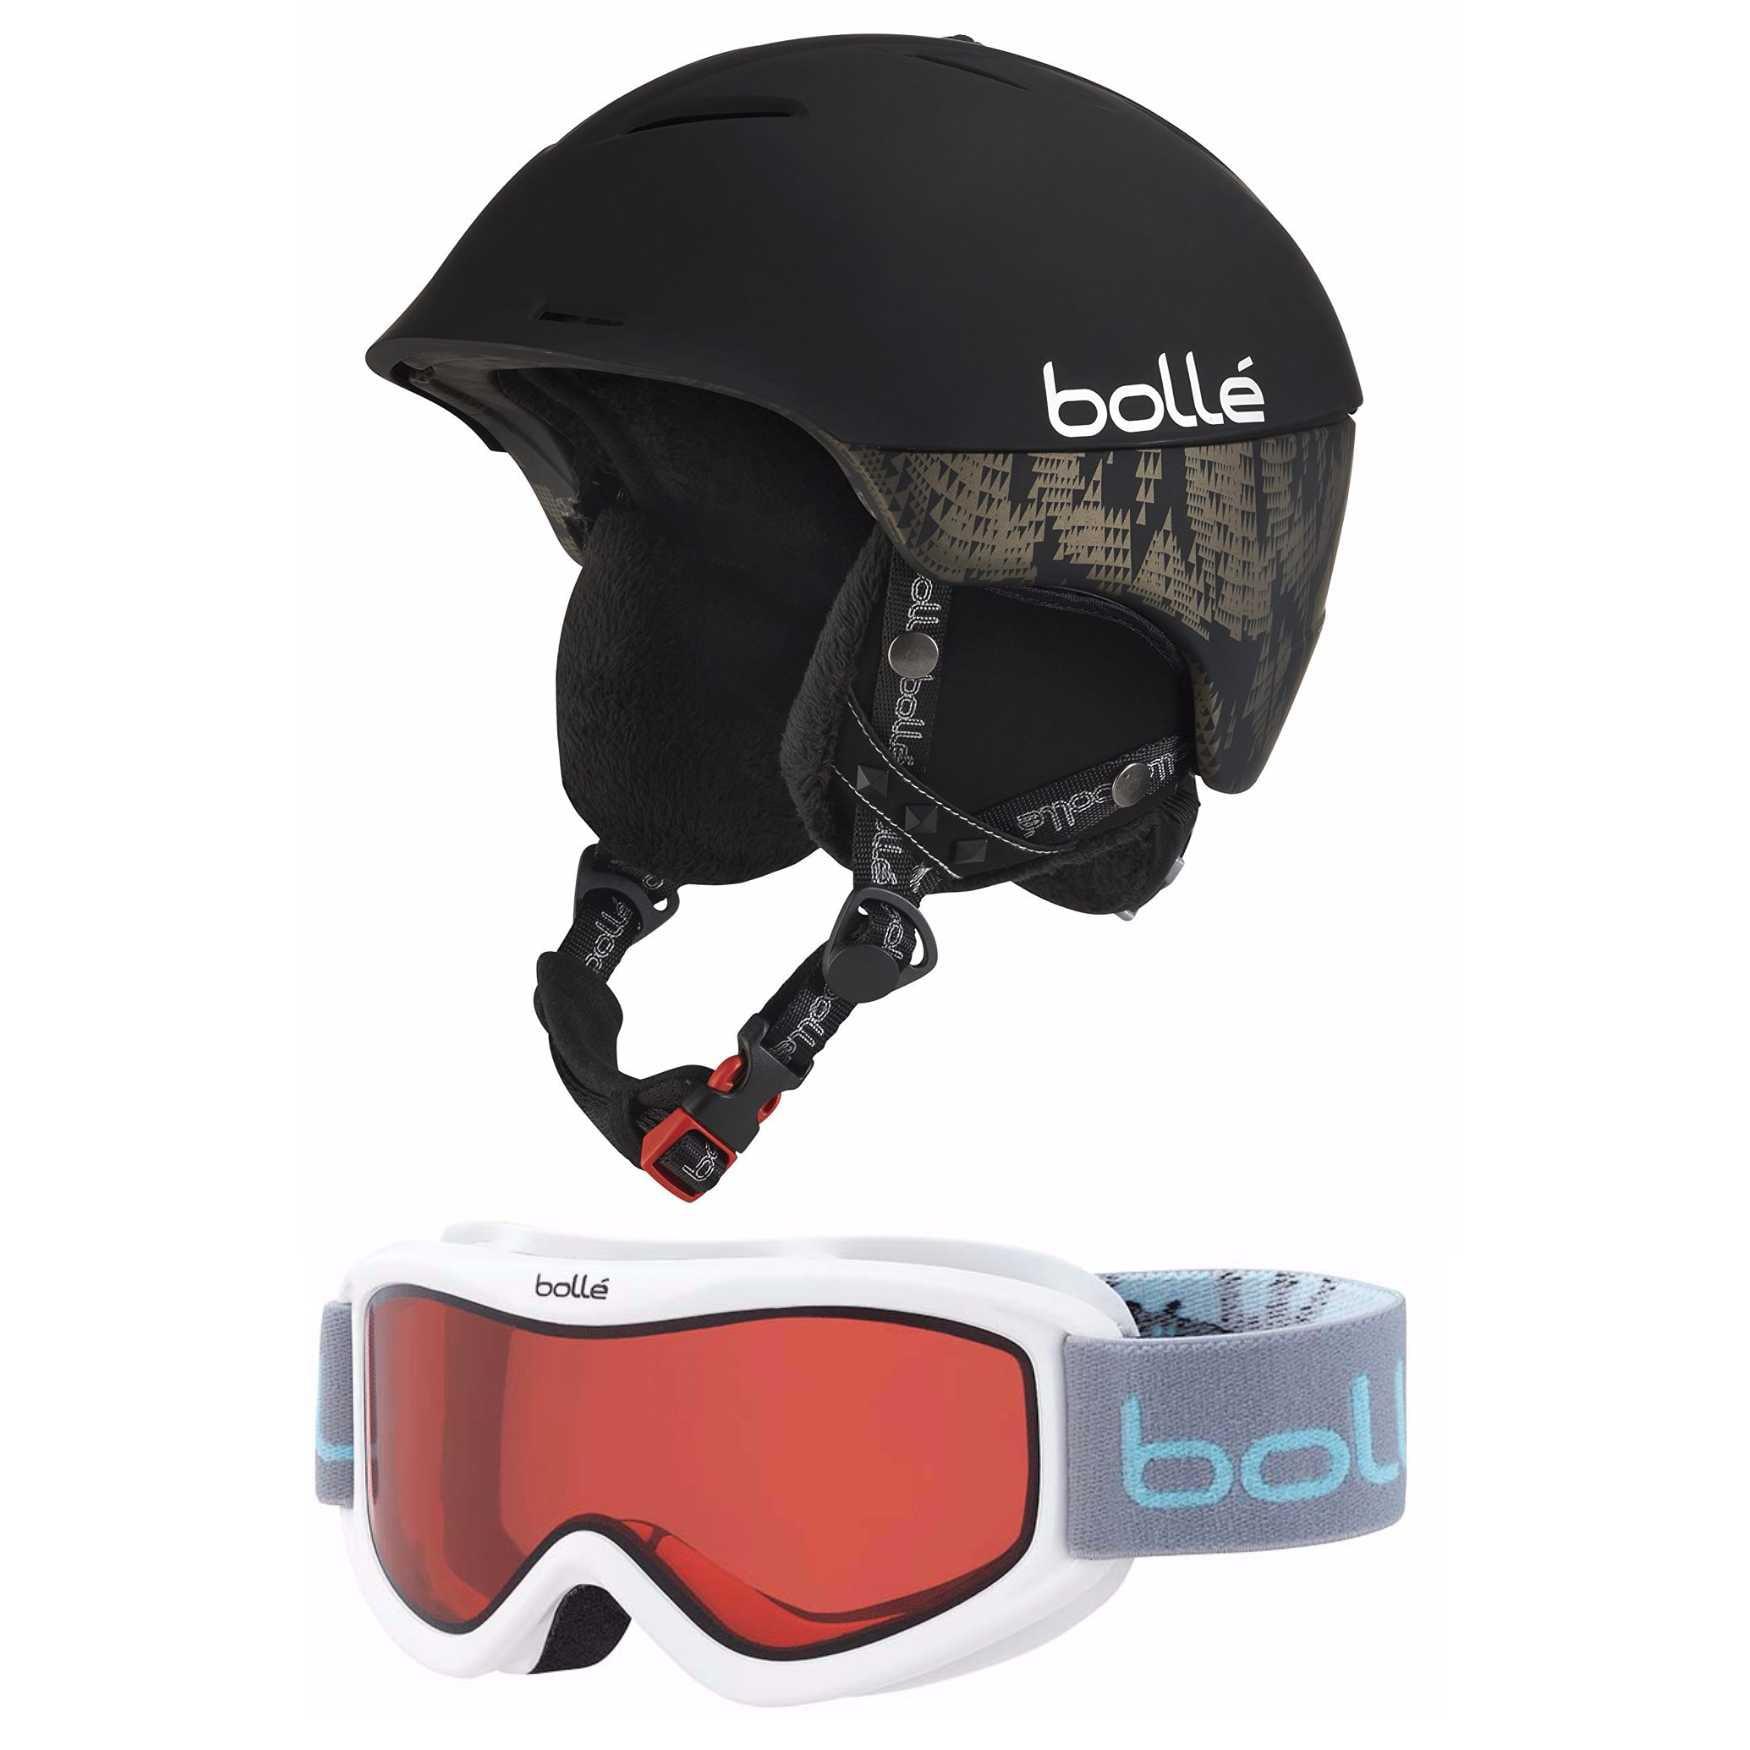 Bolle 30376 Synergy Ventilated Ski Helmet (Black, 54-58 cm) & 21579 Amp Goggles by Bolle